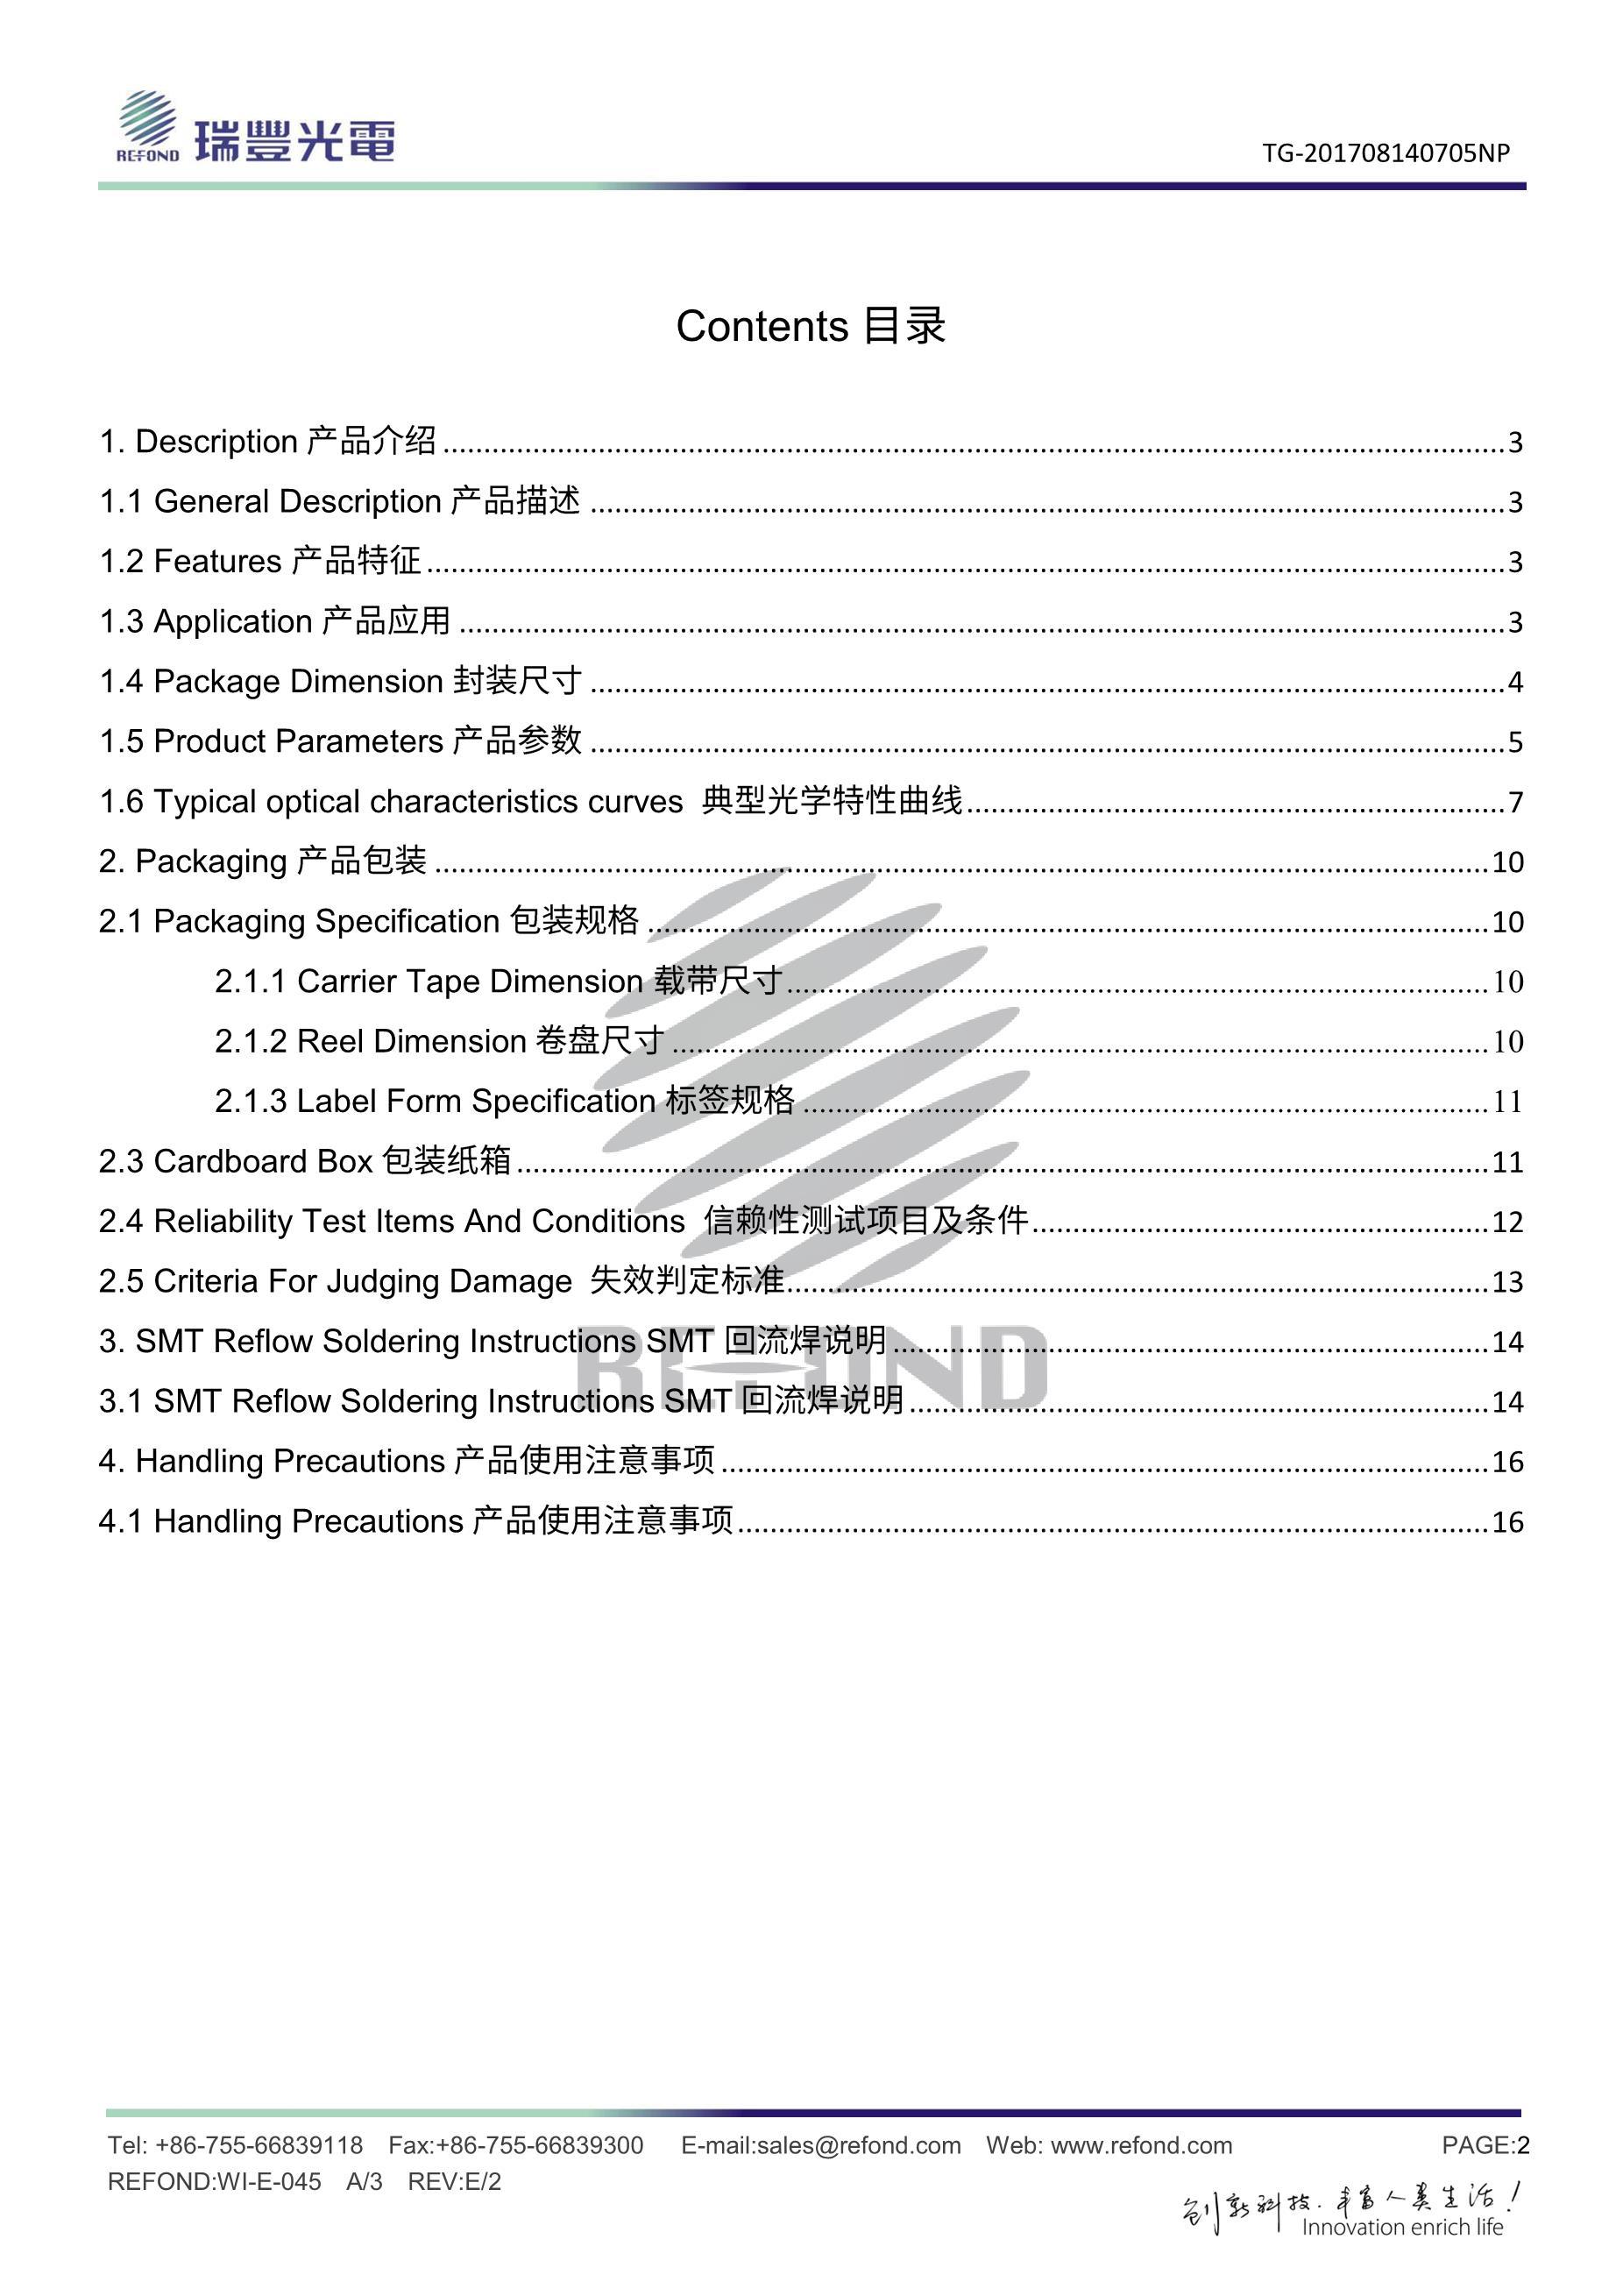 1.8V converter seat SPI Flash memory SOP8 DIP8 converter plate motherboard MX25 W25 1.8V converter board's pdf picture 2